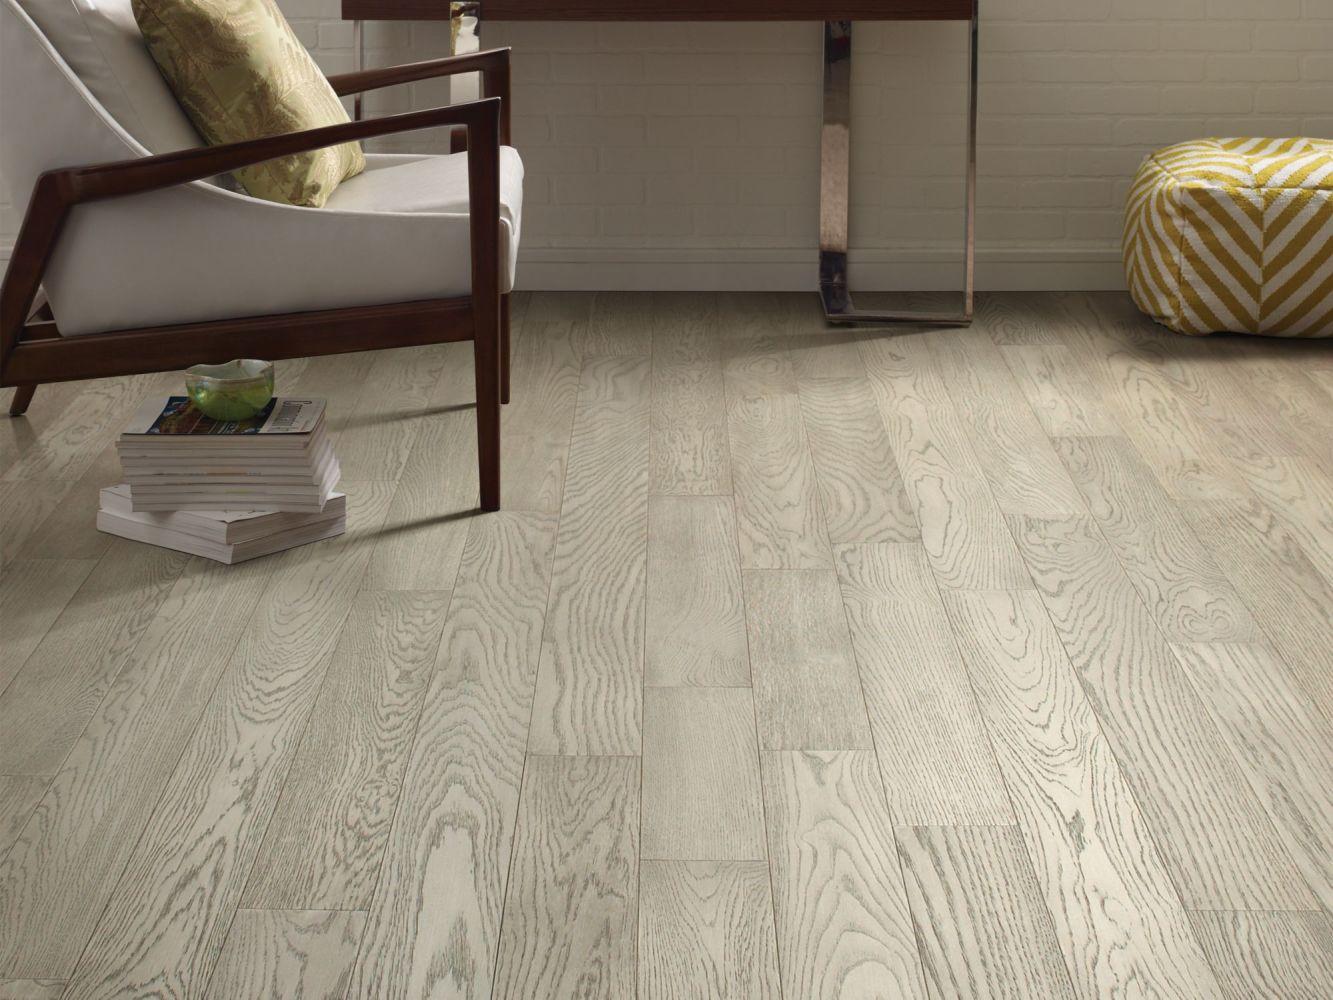 Shaw Floors Home Fn Gold Hardwood Park Avenue Plank Roosevelt 05014_HW704